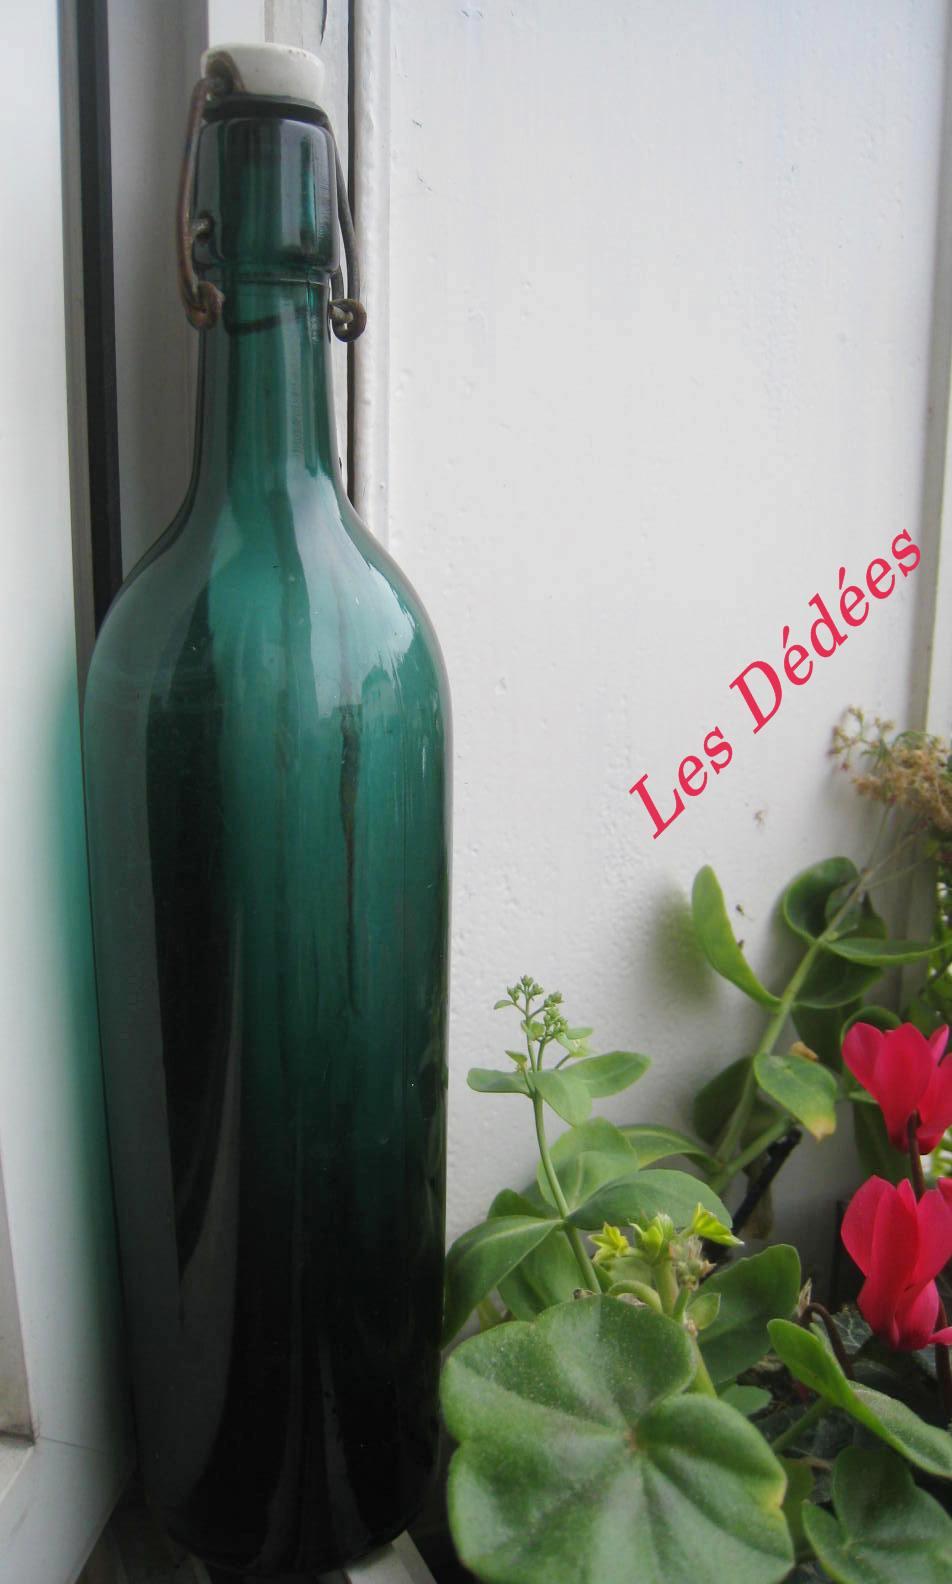 Les dedees : vintage, recup, creations: ANCIENNE BOUTEILLE \